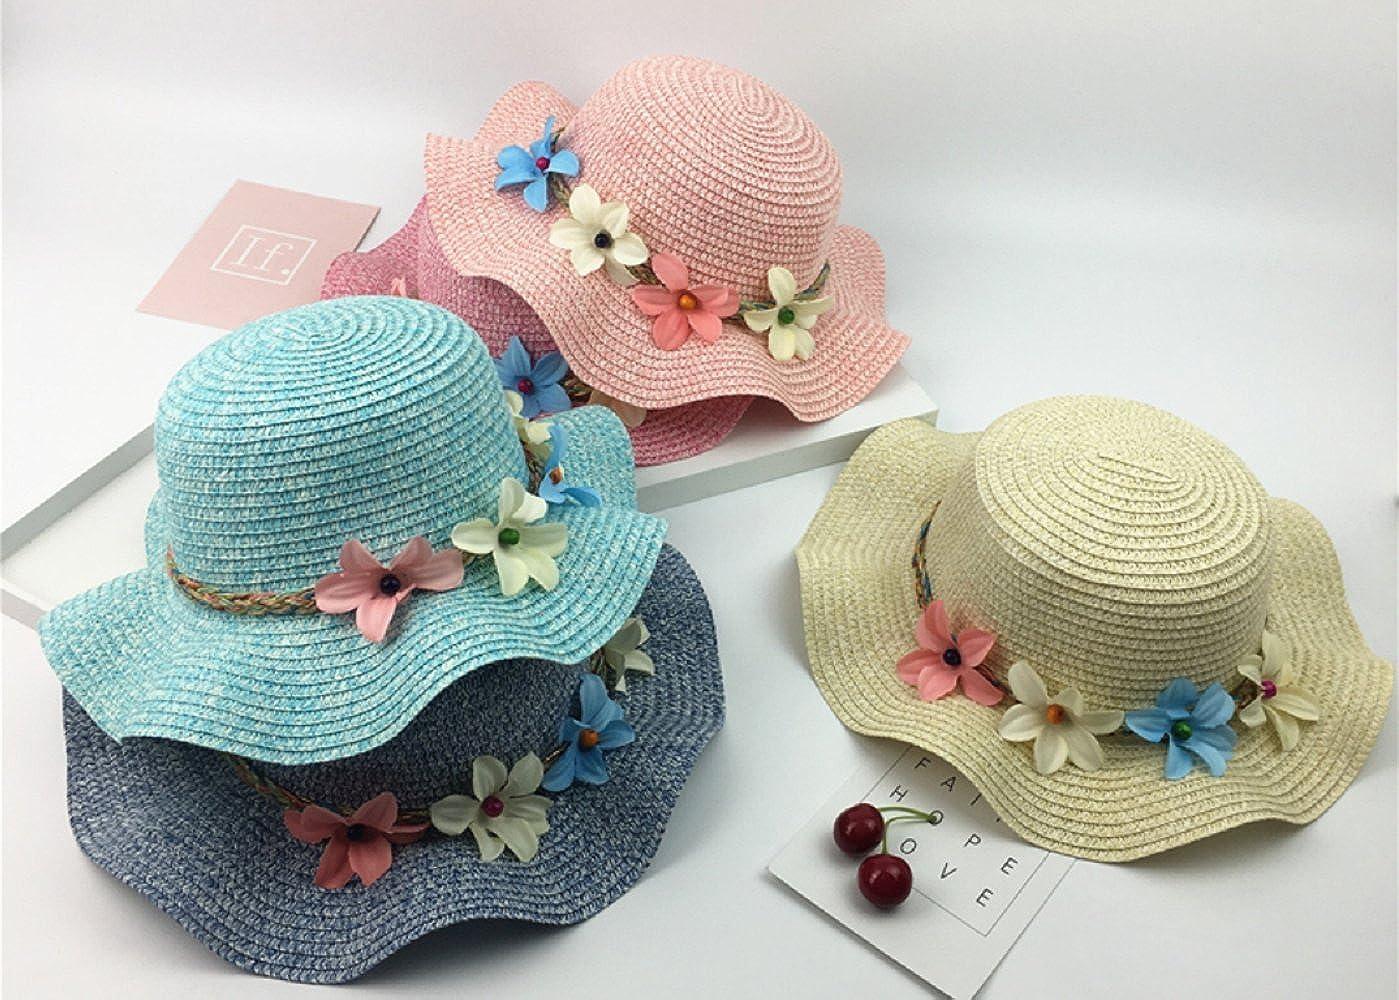 WeiMay Children Girls Colorful Floppy SummerStraw Sunhats Wide Brim Beach Cap